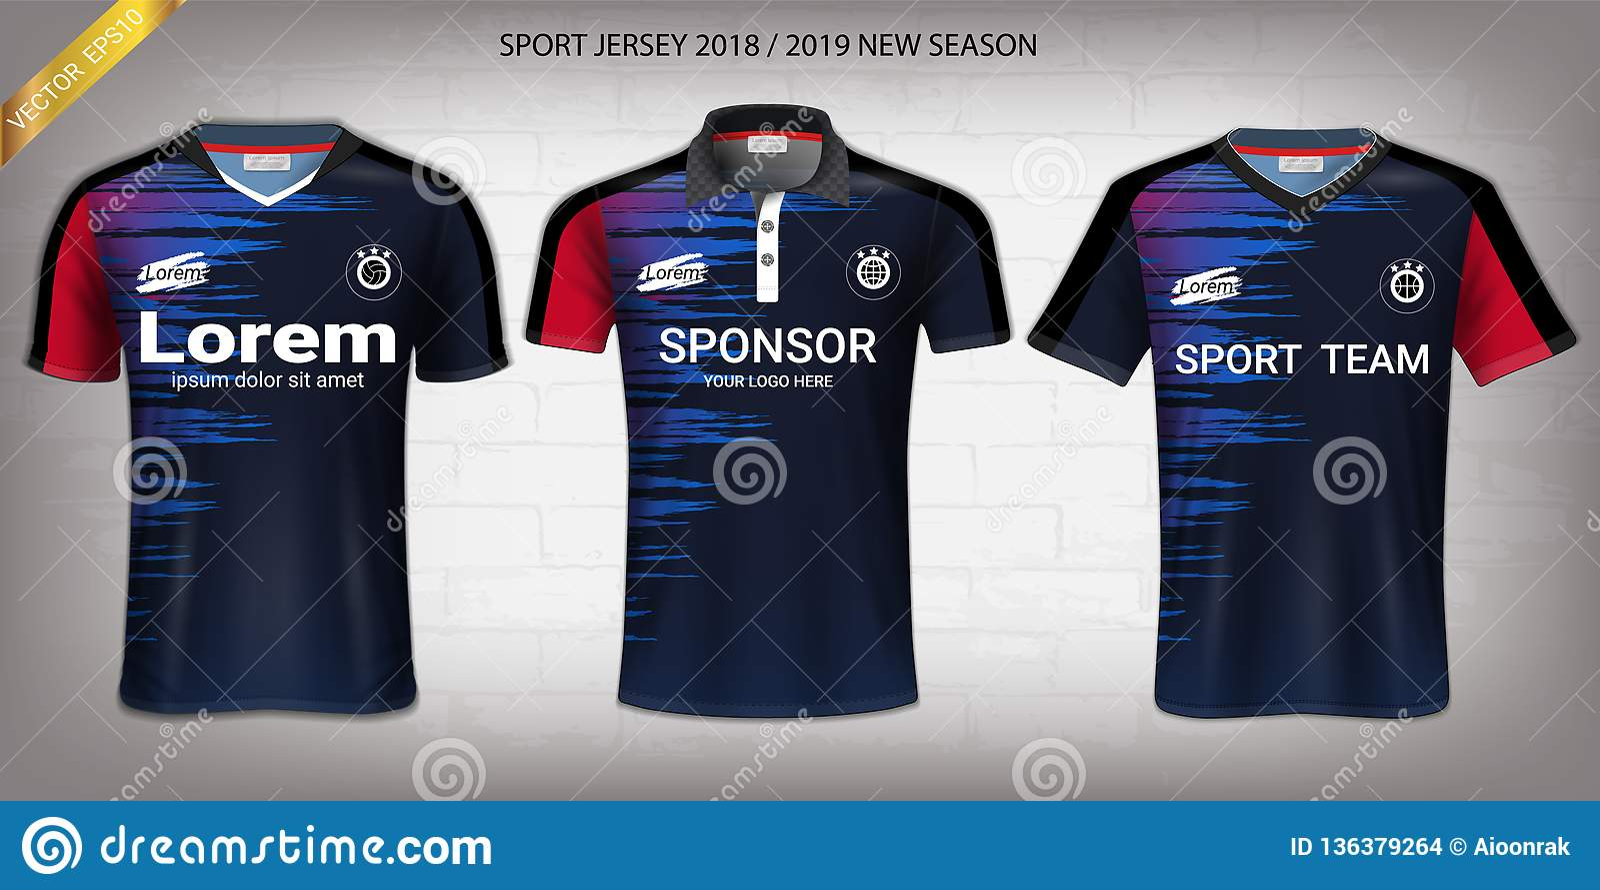 d0fbbb123 Sport Jersey